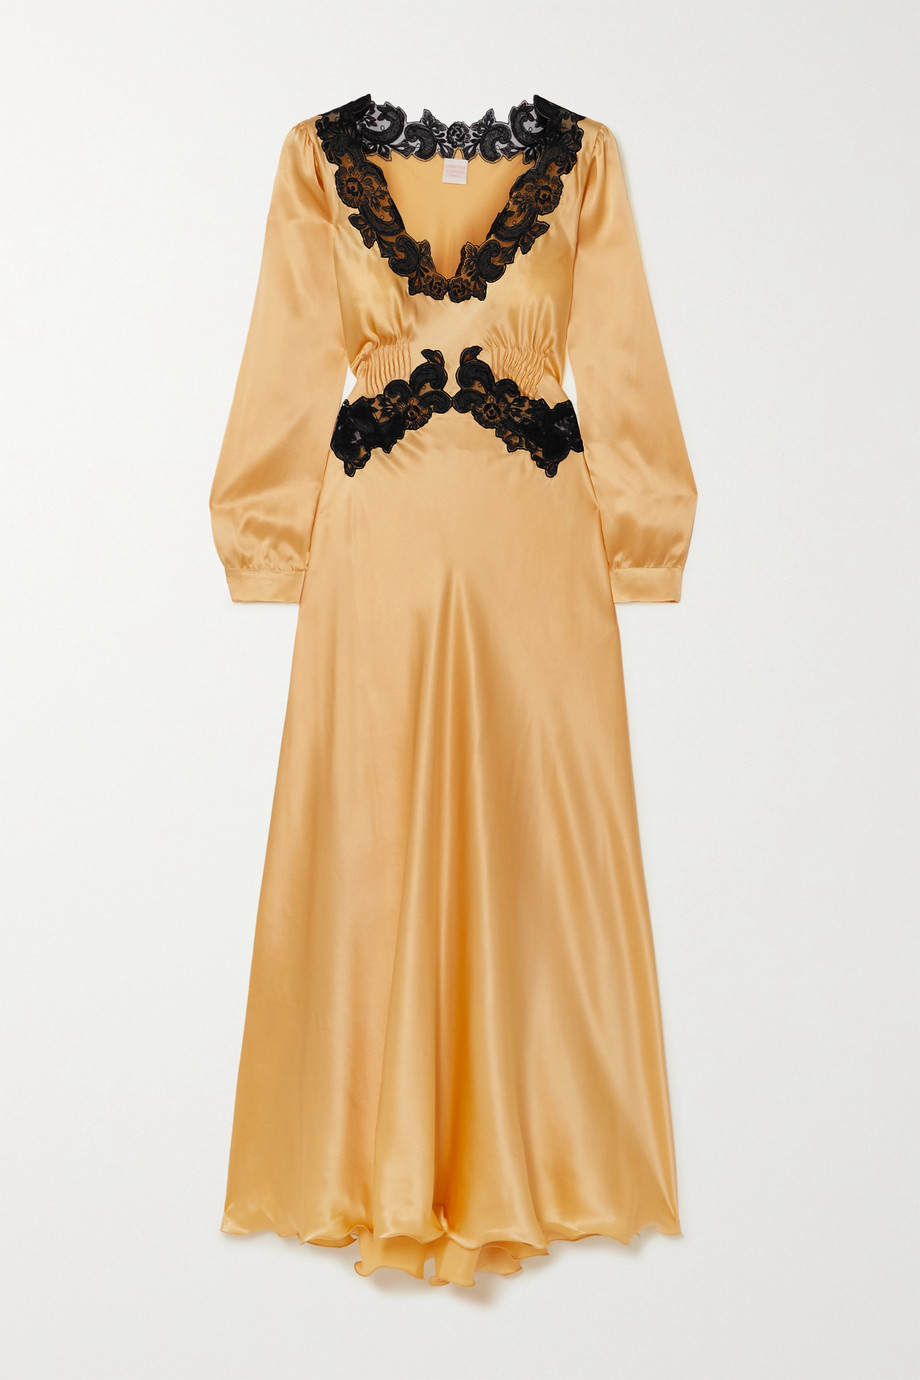 Loretta Caponi Lugina lace-trimmed pintucked silk-satin dress